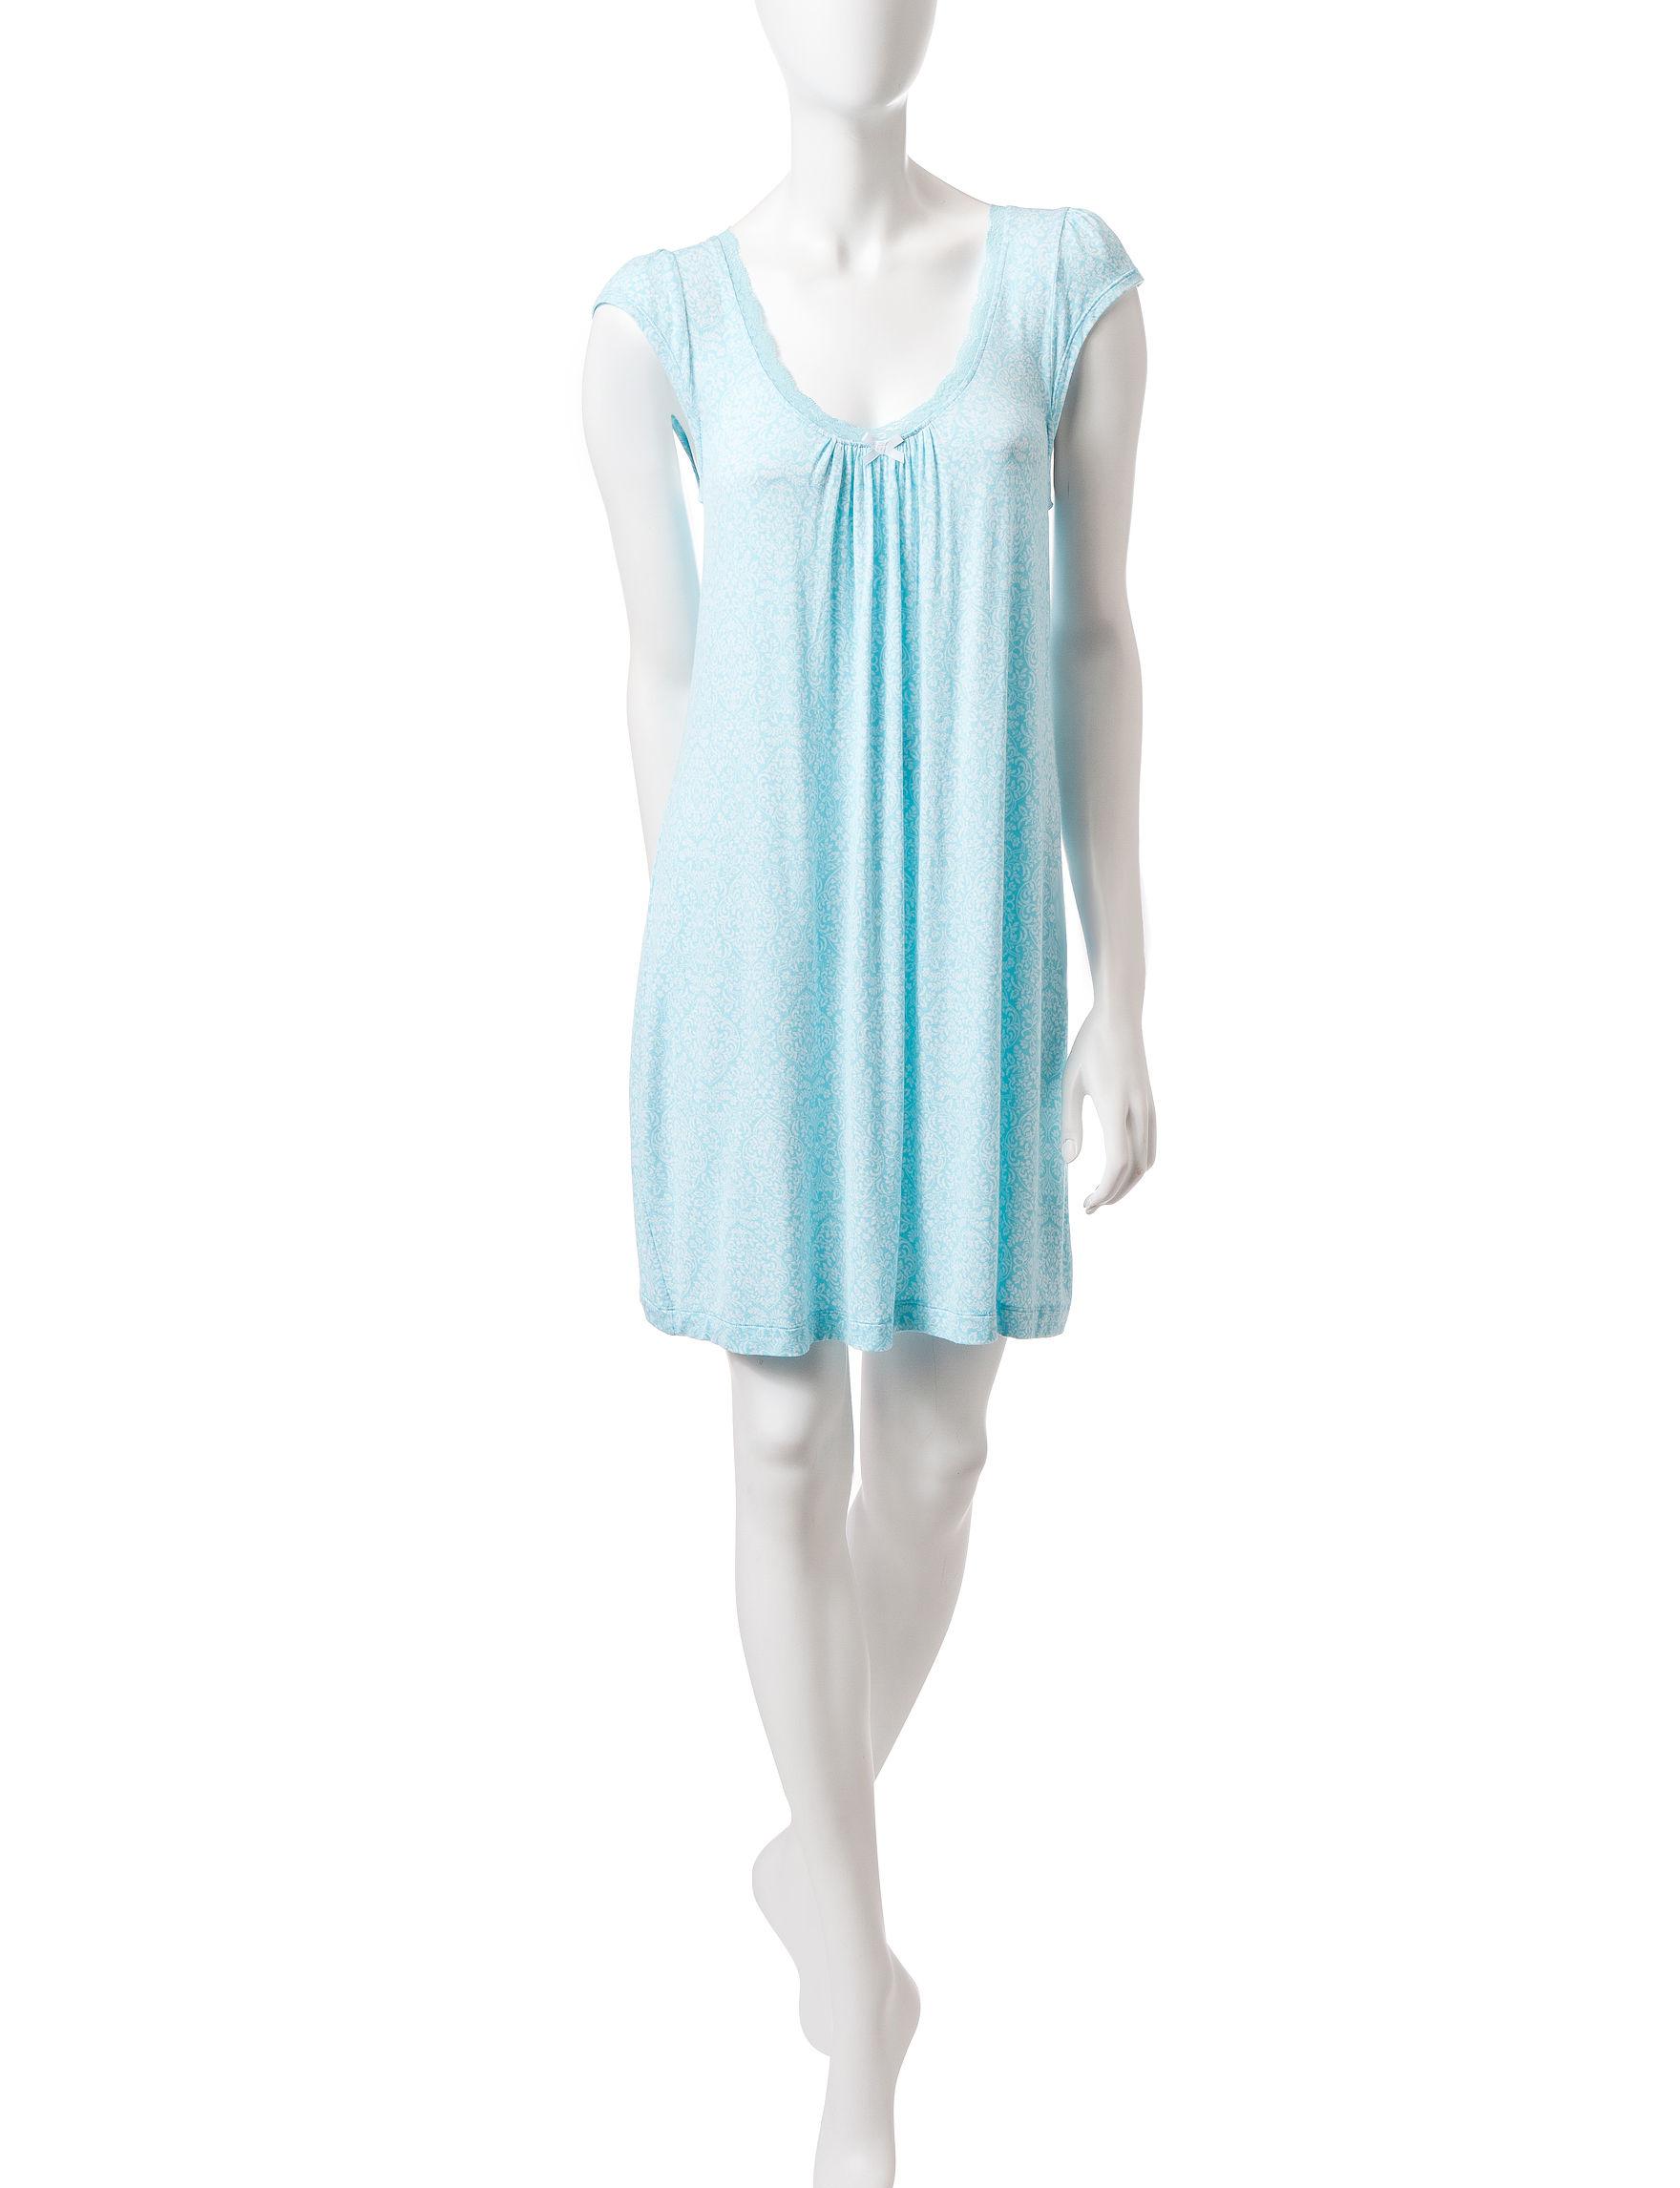 Laura Ashley Blue / White House Dresses